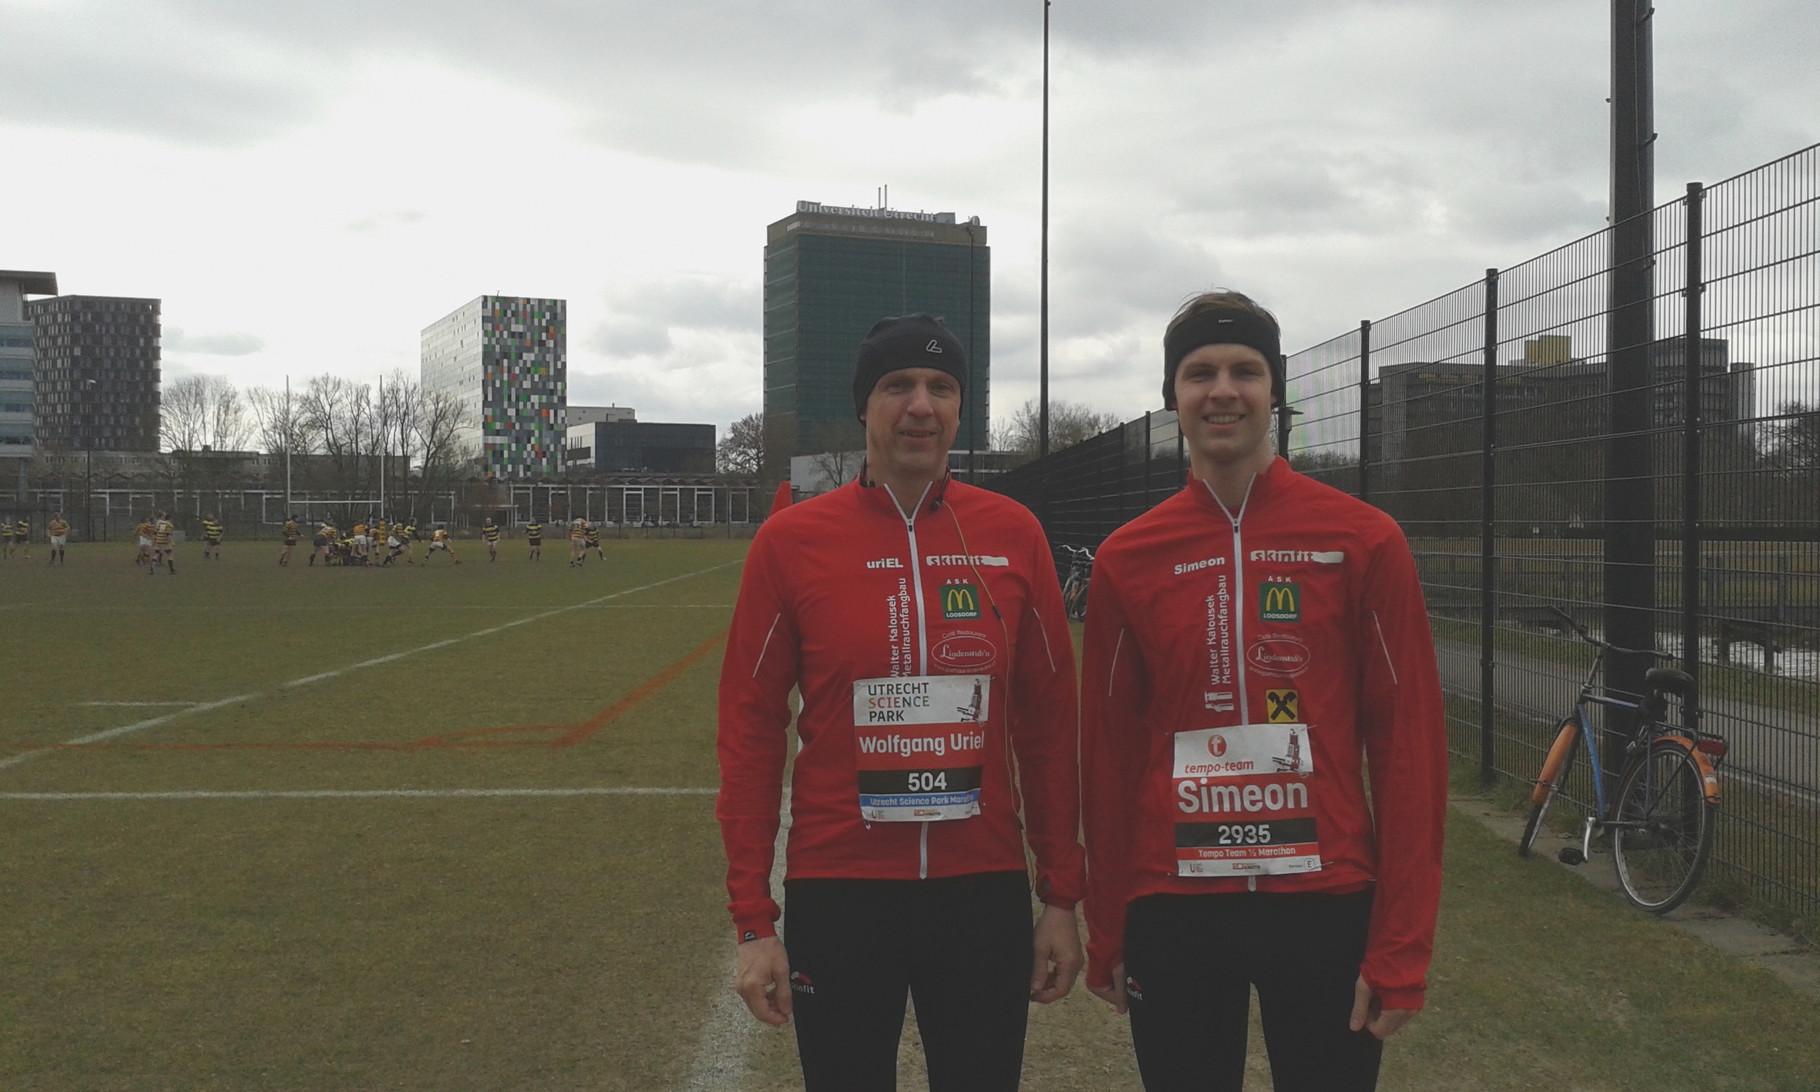 Unser Team in Holland: Vater & Sohn: Wolfgang & Simeon